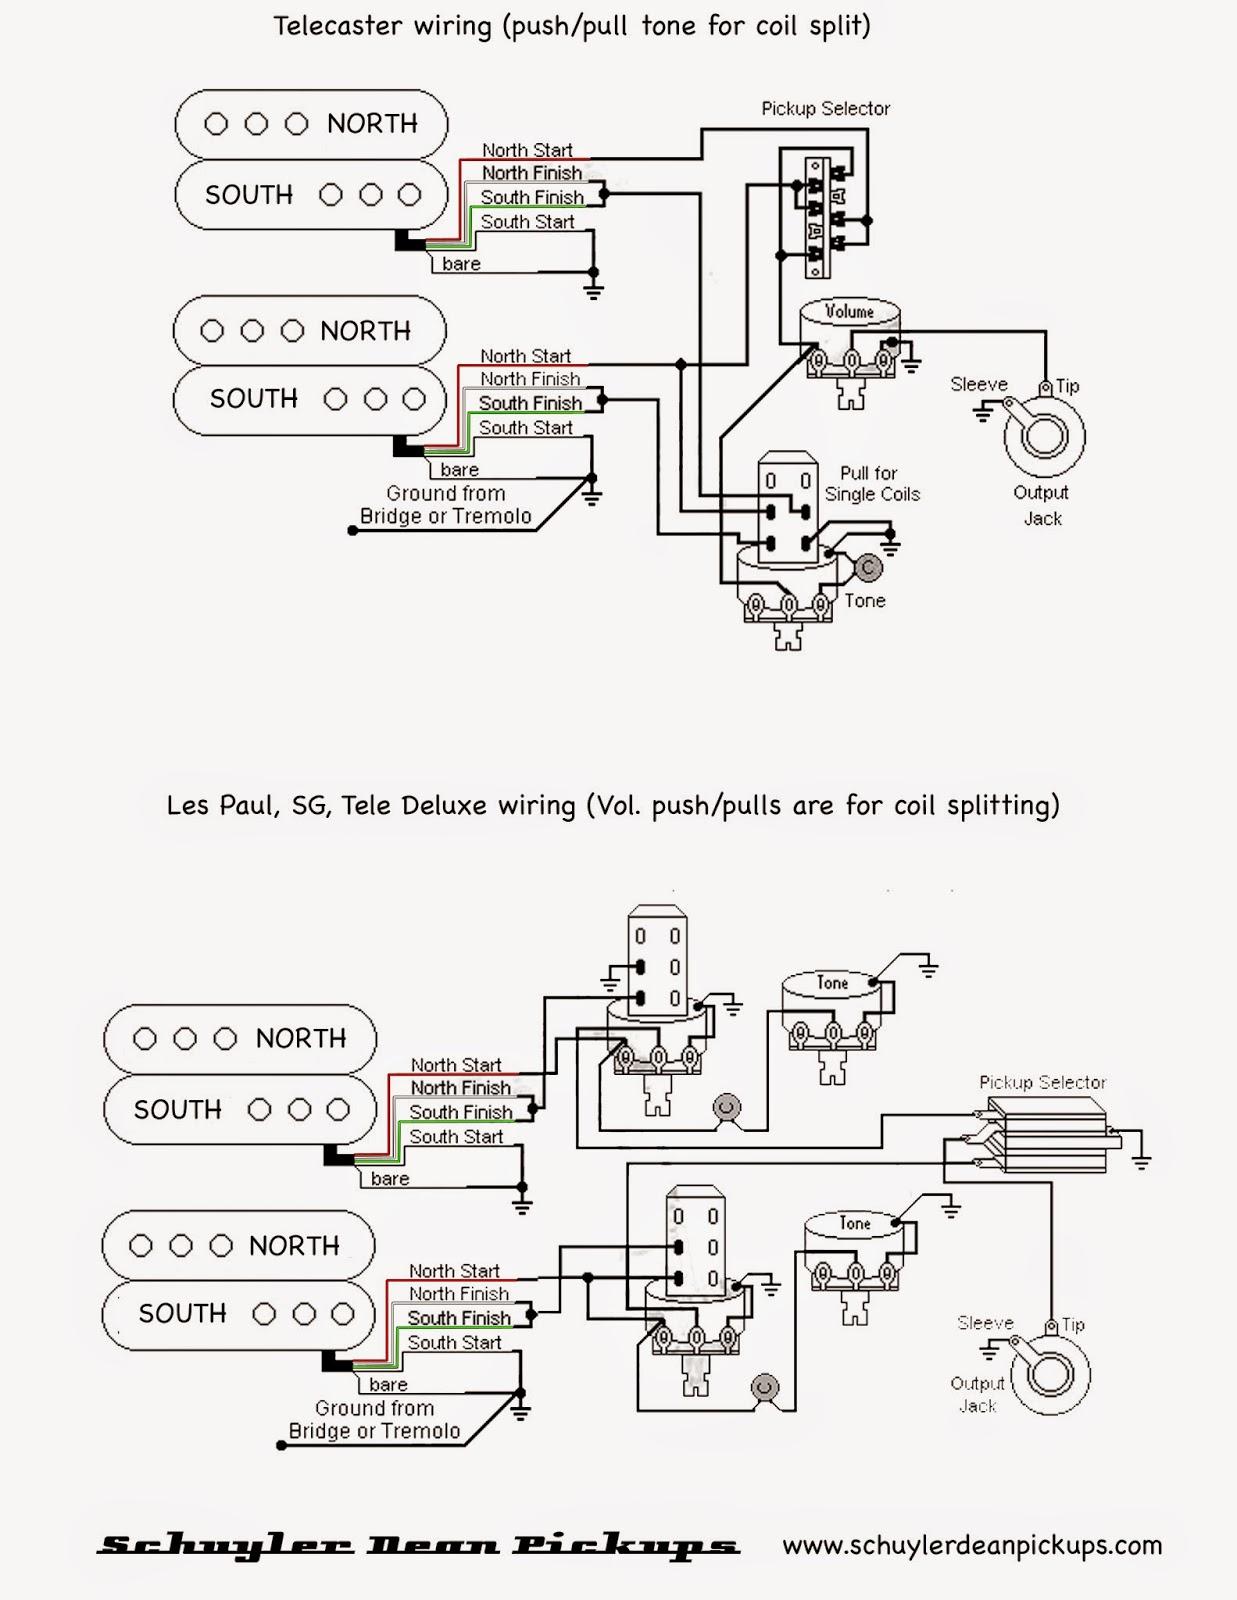 Pull Pot Humbucker Coil Split Wiring Diagram | Wiring Diagram - Hss Wiring Diagram Coil Split